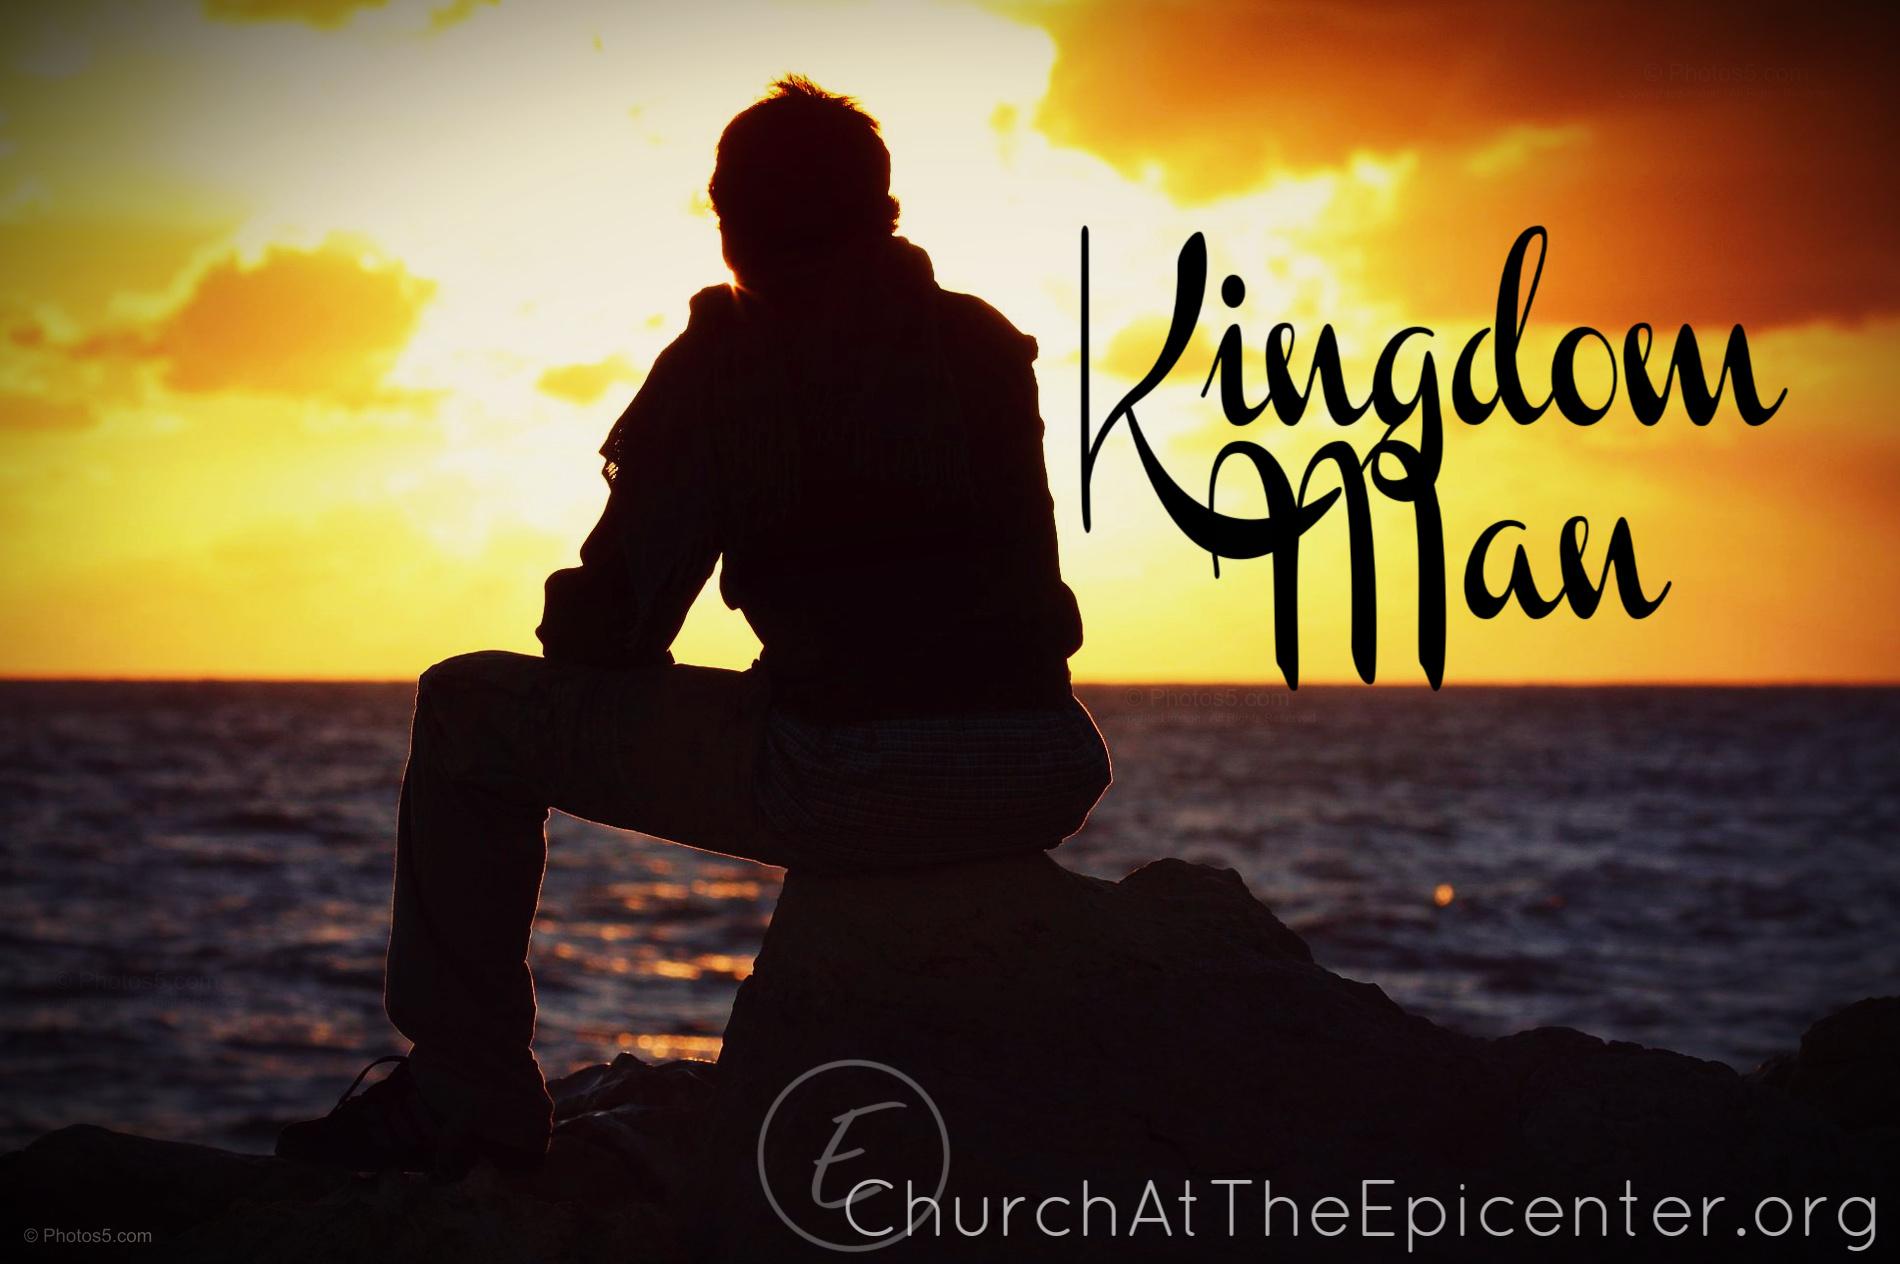 Thursday Nights    6pm Sunset Men Bible Study      7pm Kingdom Man